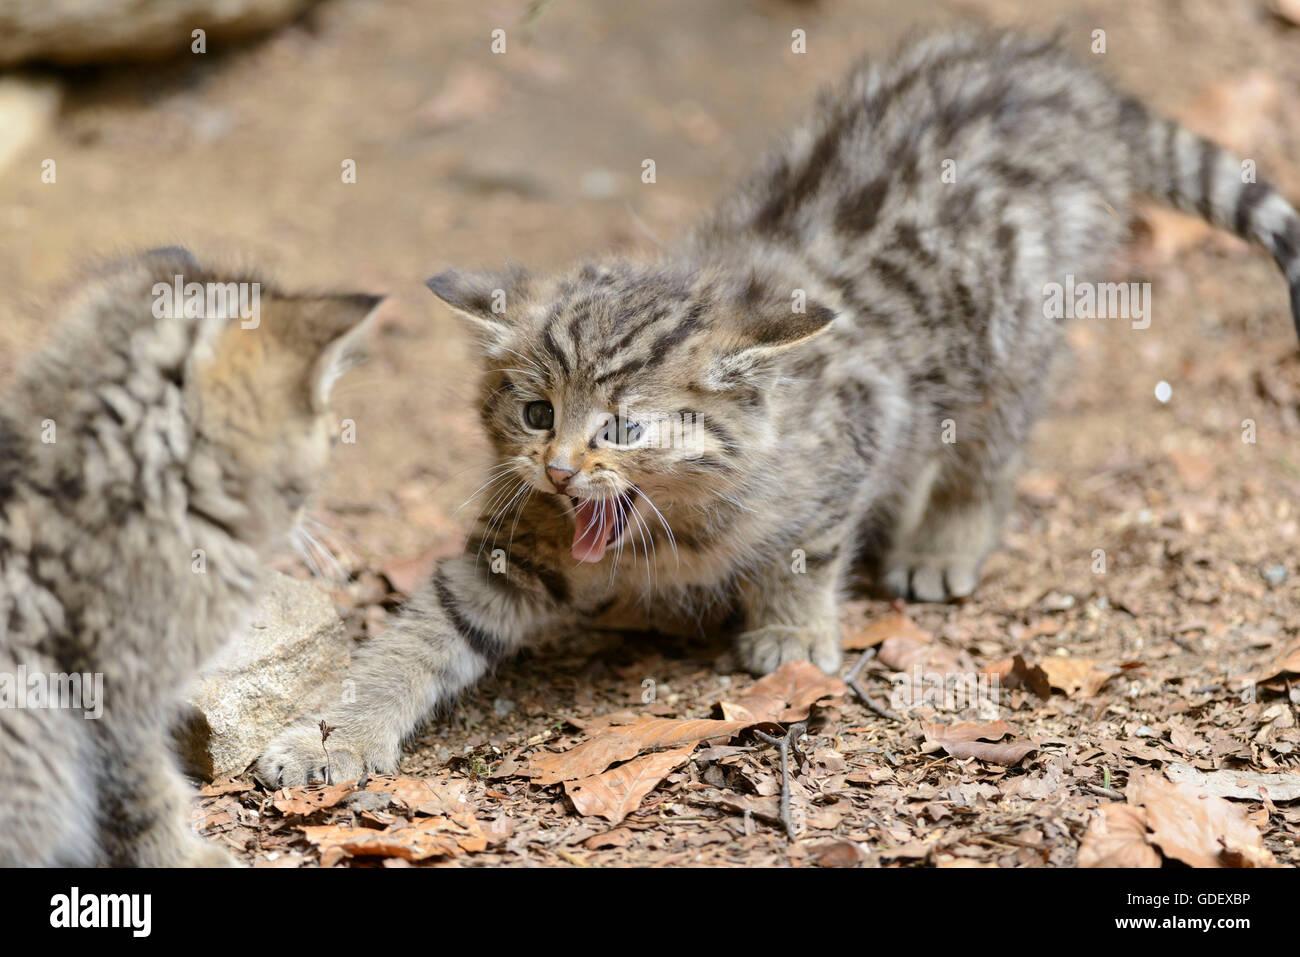 Common Wild Cats, kittens, National Park Bavarian Forest, Bavaria, Germany, Felis silvestris - Stock Image